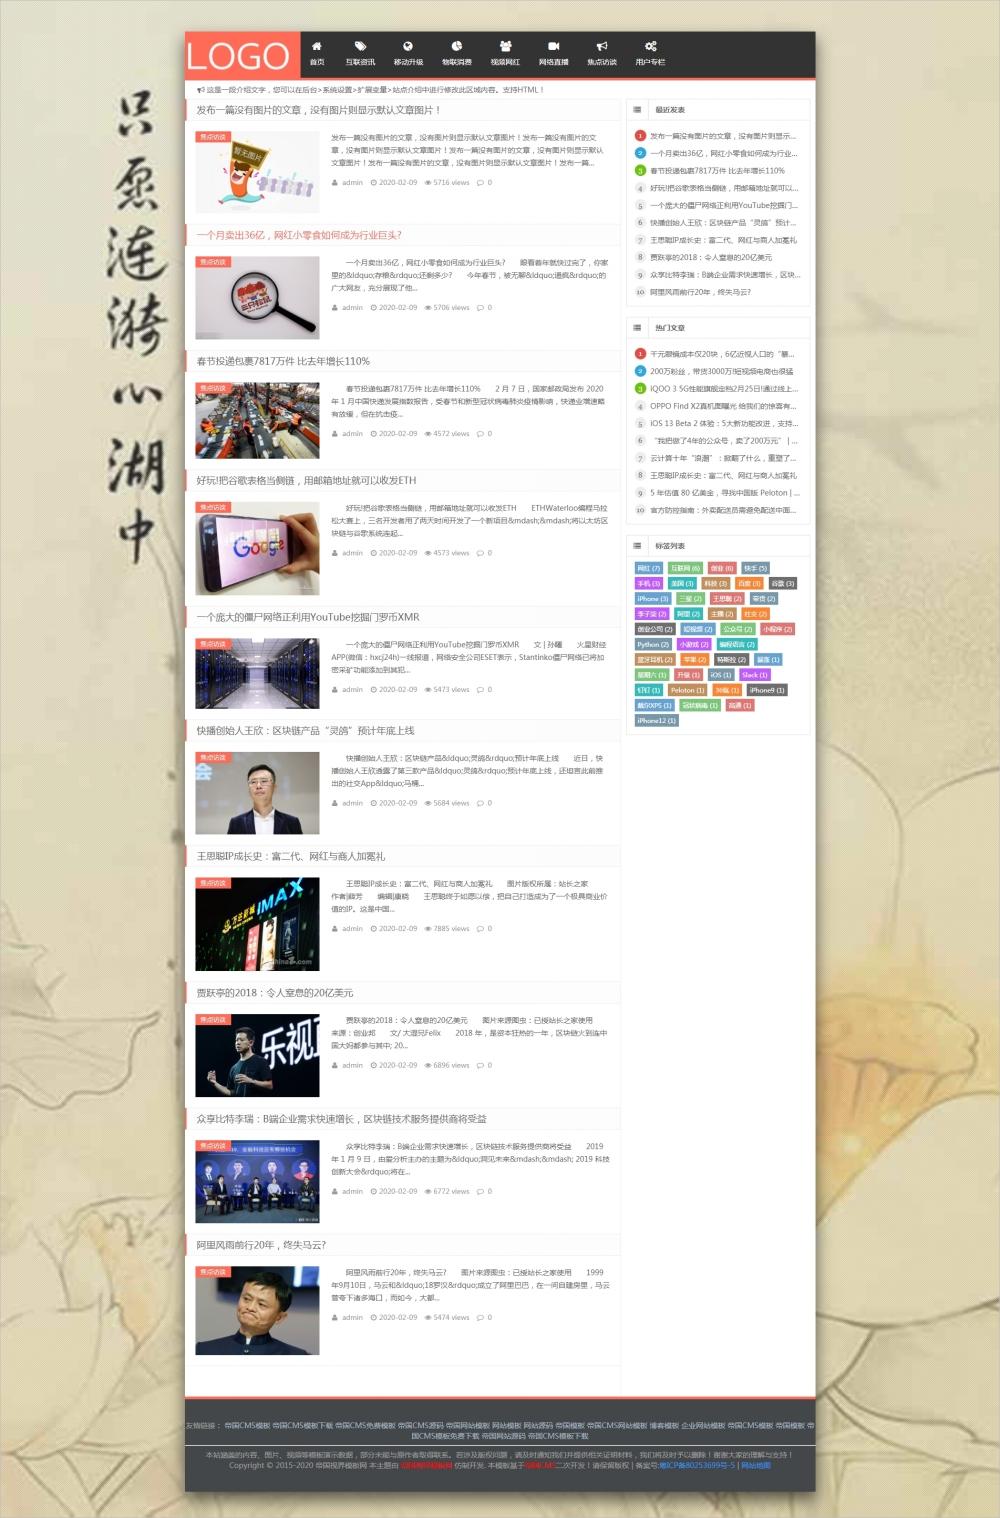 [DG-100]帝国CMS自适应博客模板,帝国CMS响应式文章个人博客资讯模板 [DG-100]帝国CMS自适应博客模板,帝国CMS响应式文章个人博客资讯模板 博客文章 第1张